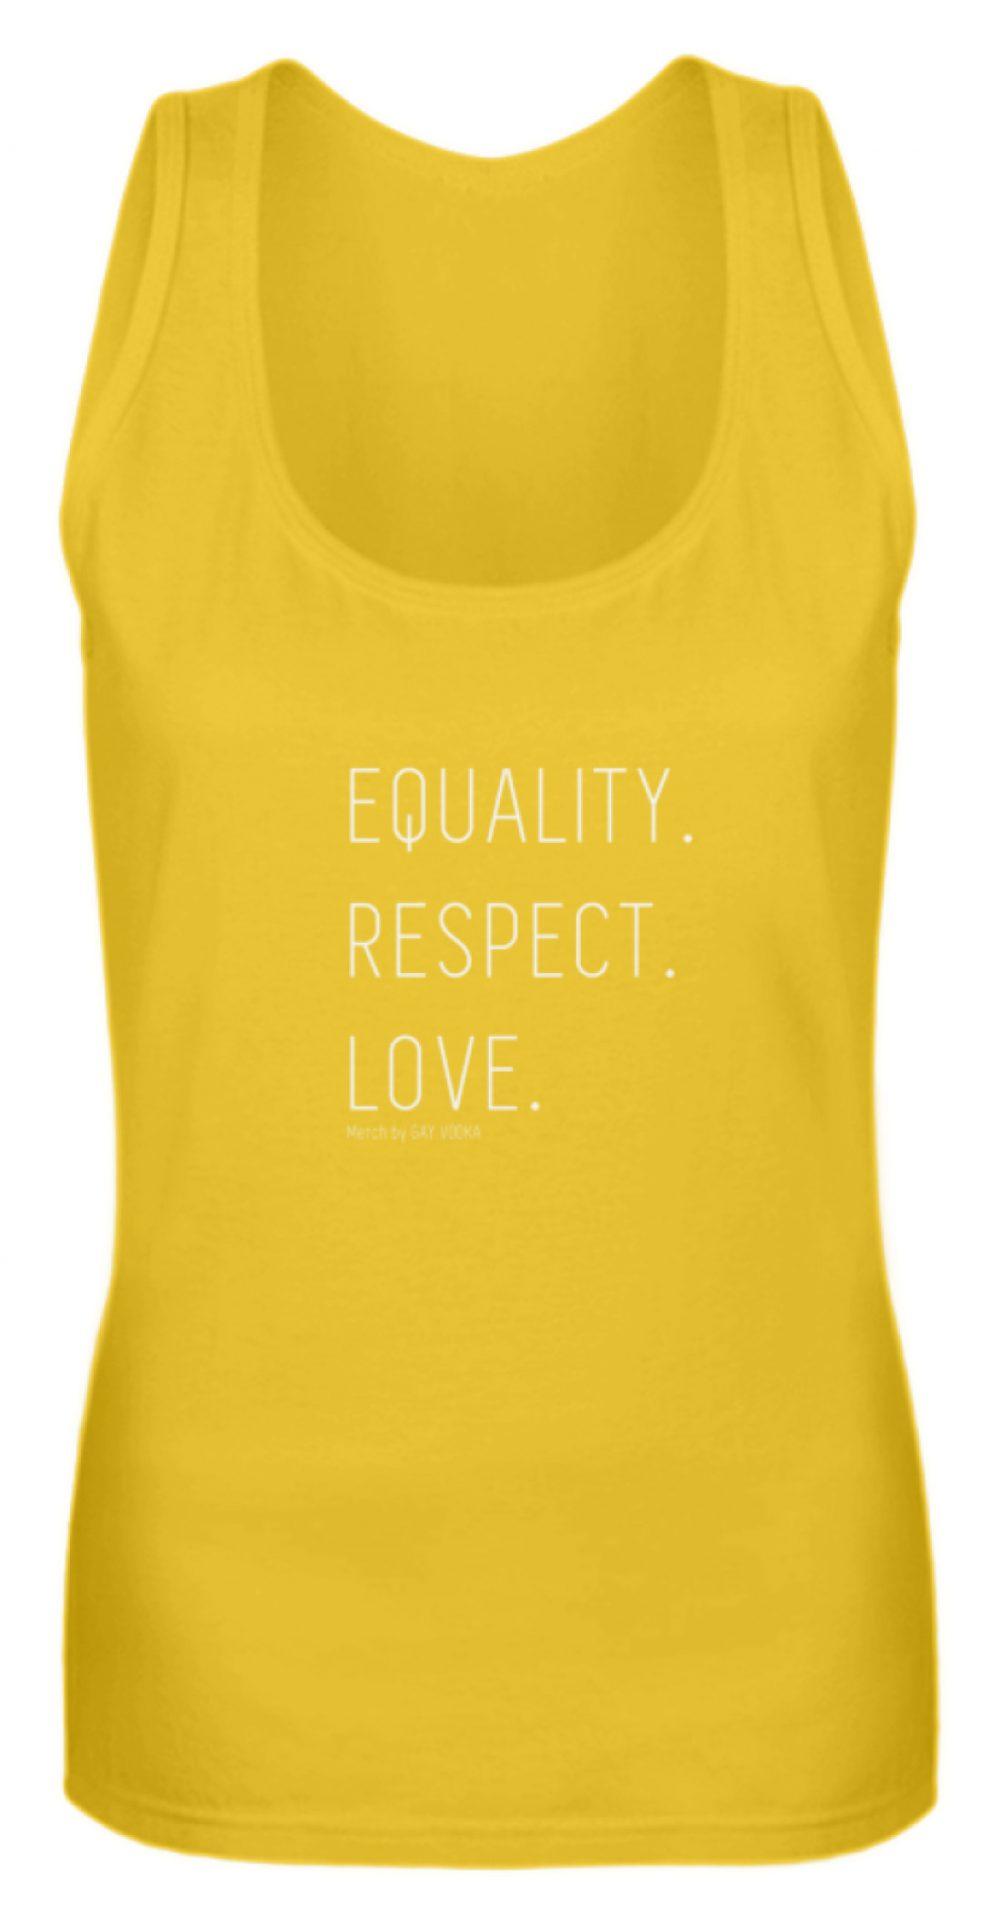 EQUALITY. RESPECT. LOVE. - Frauen Tanktop-3201